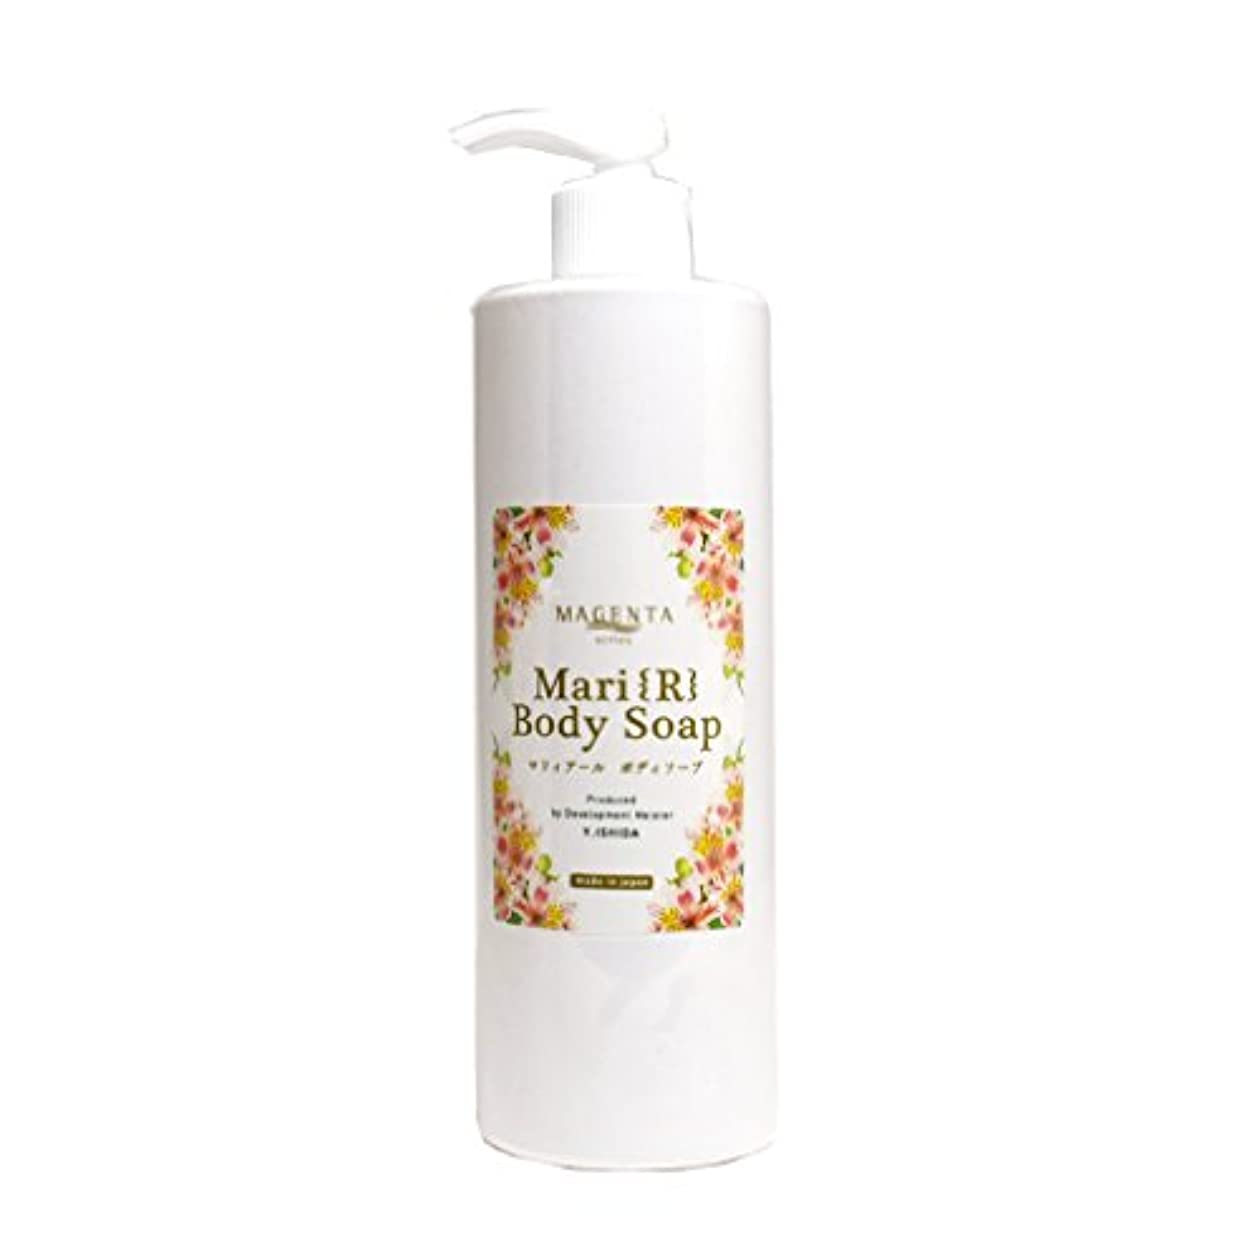 MAGENTA Mari R Body Soap 400ml マジェンタ マリイアール ボディソープ 日本製